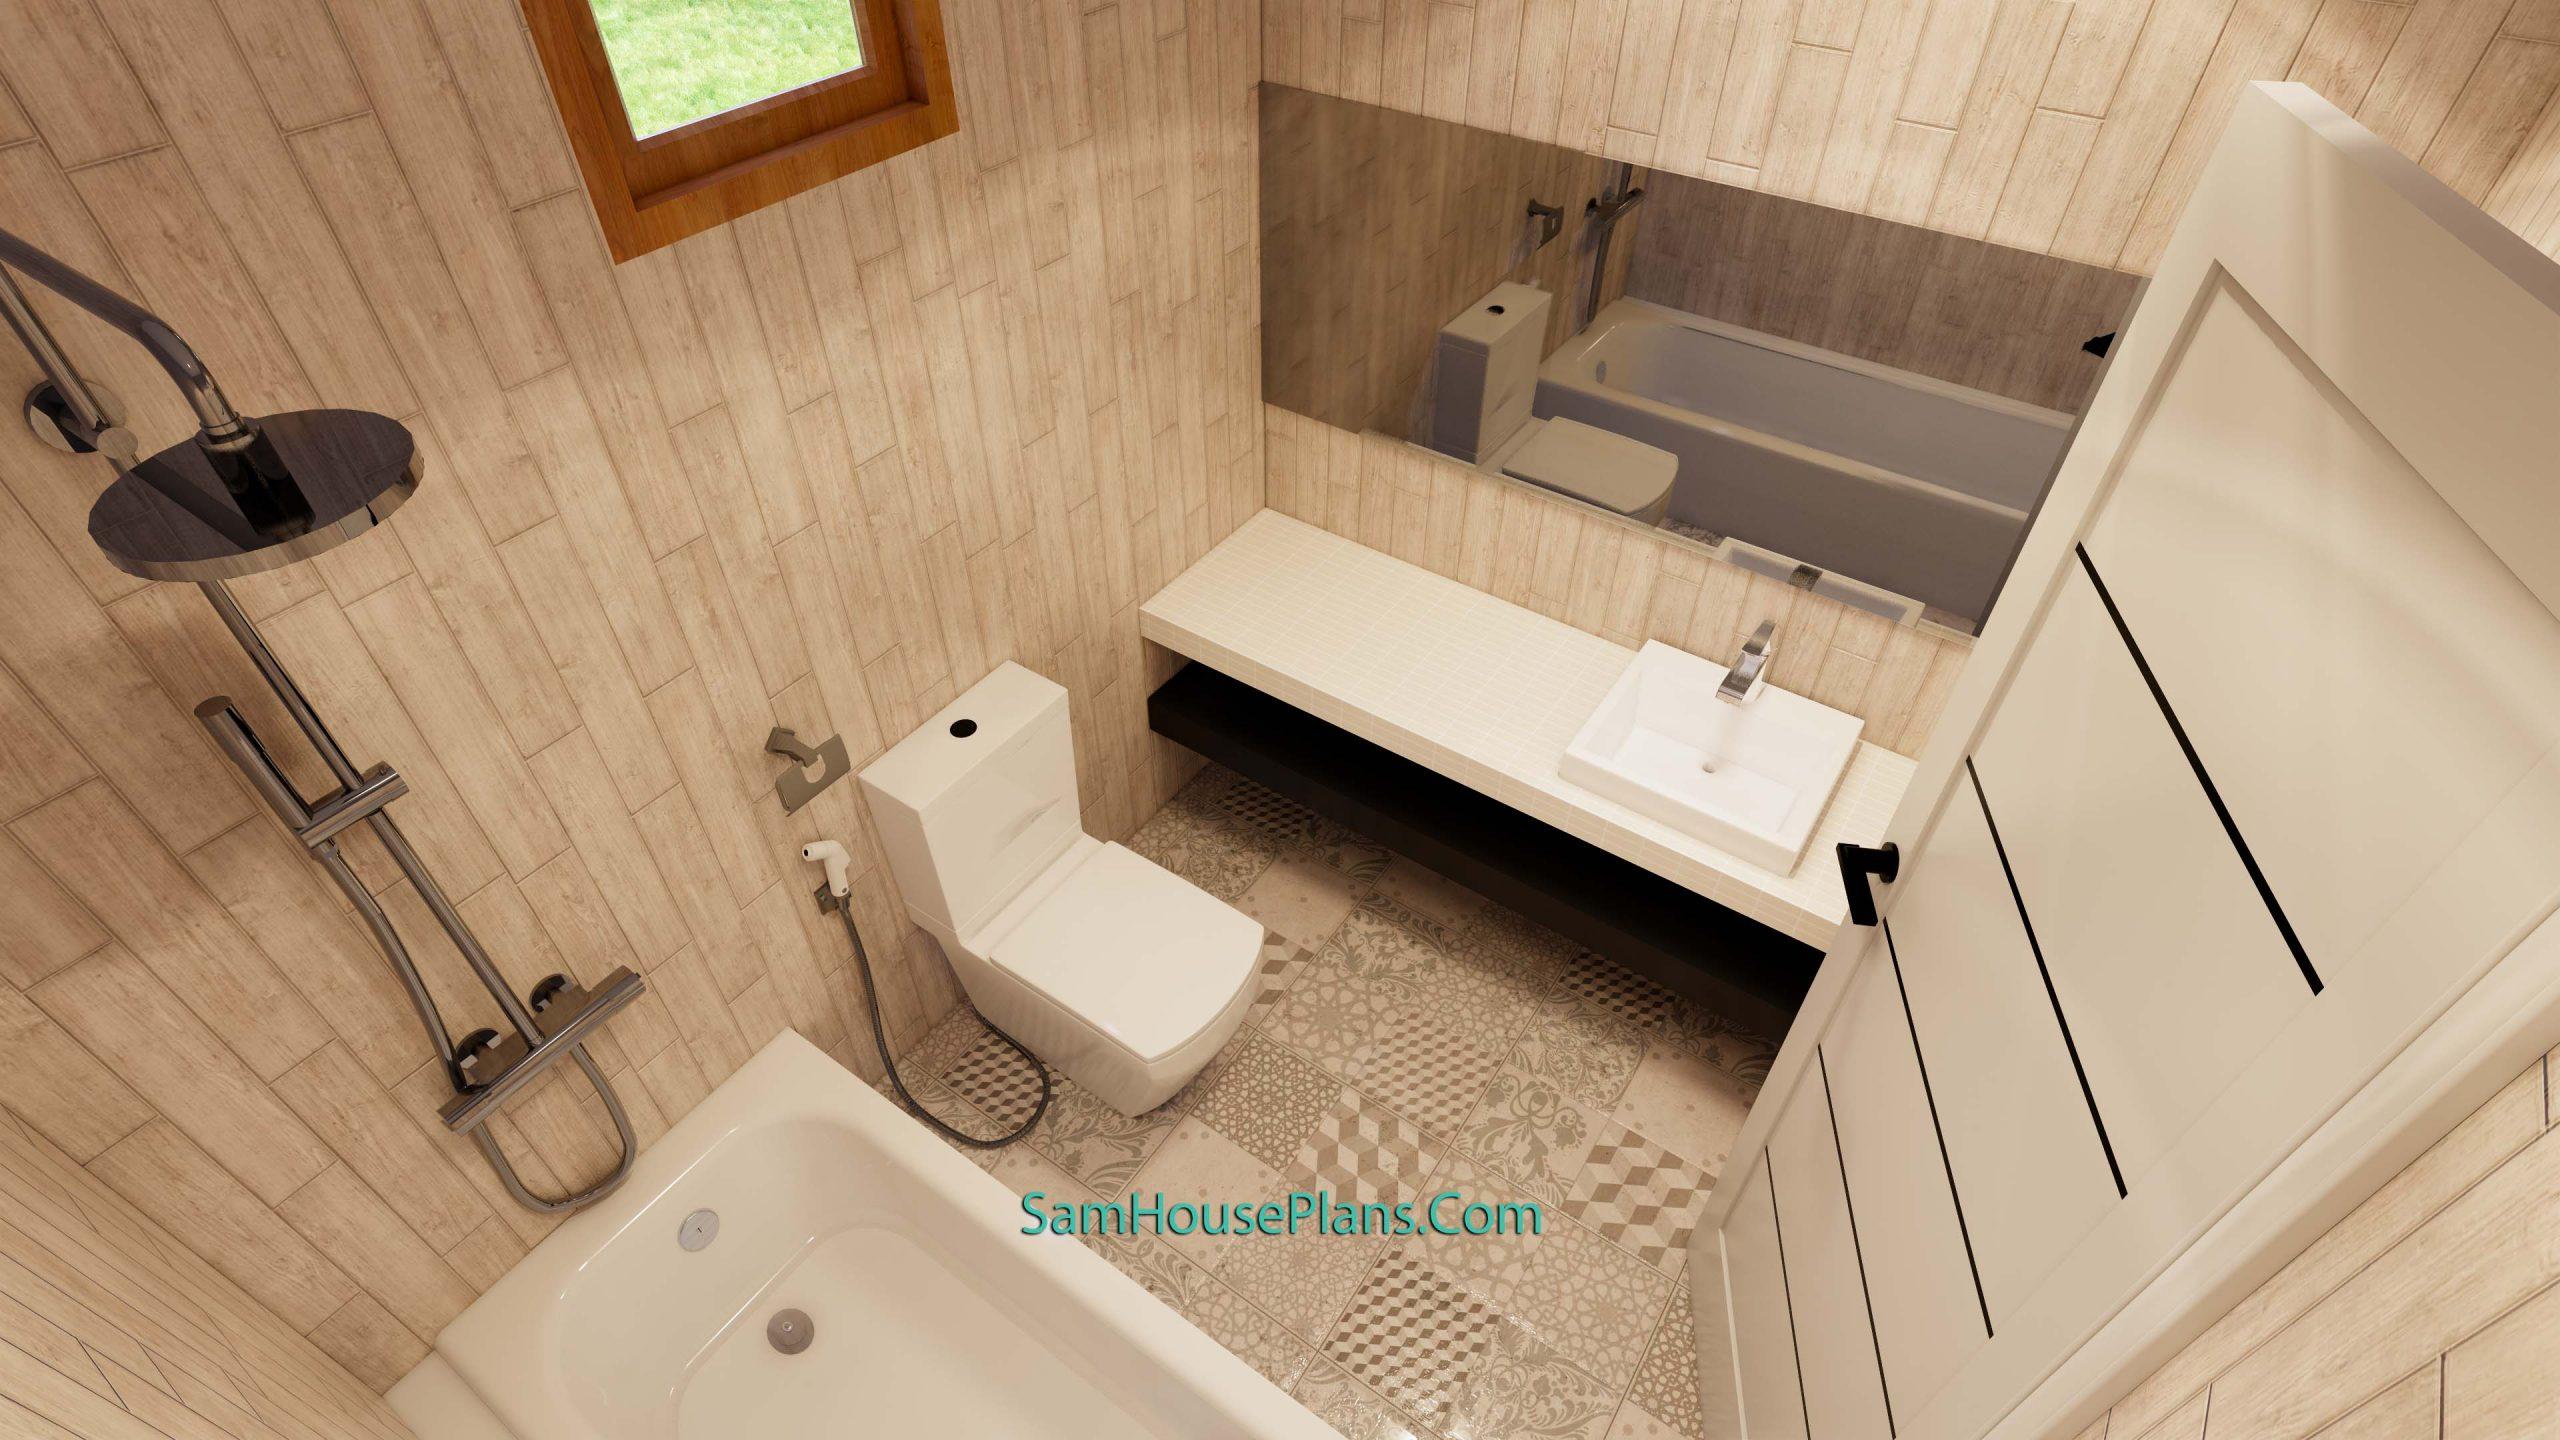 Interior Master Bathroom Modern House Plan 11x11 Meter 36x36 Feet 3 Beds PDF Plan 3d